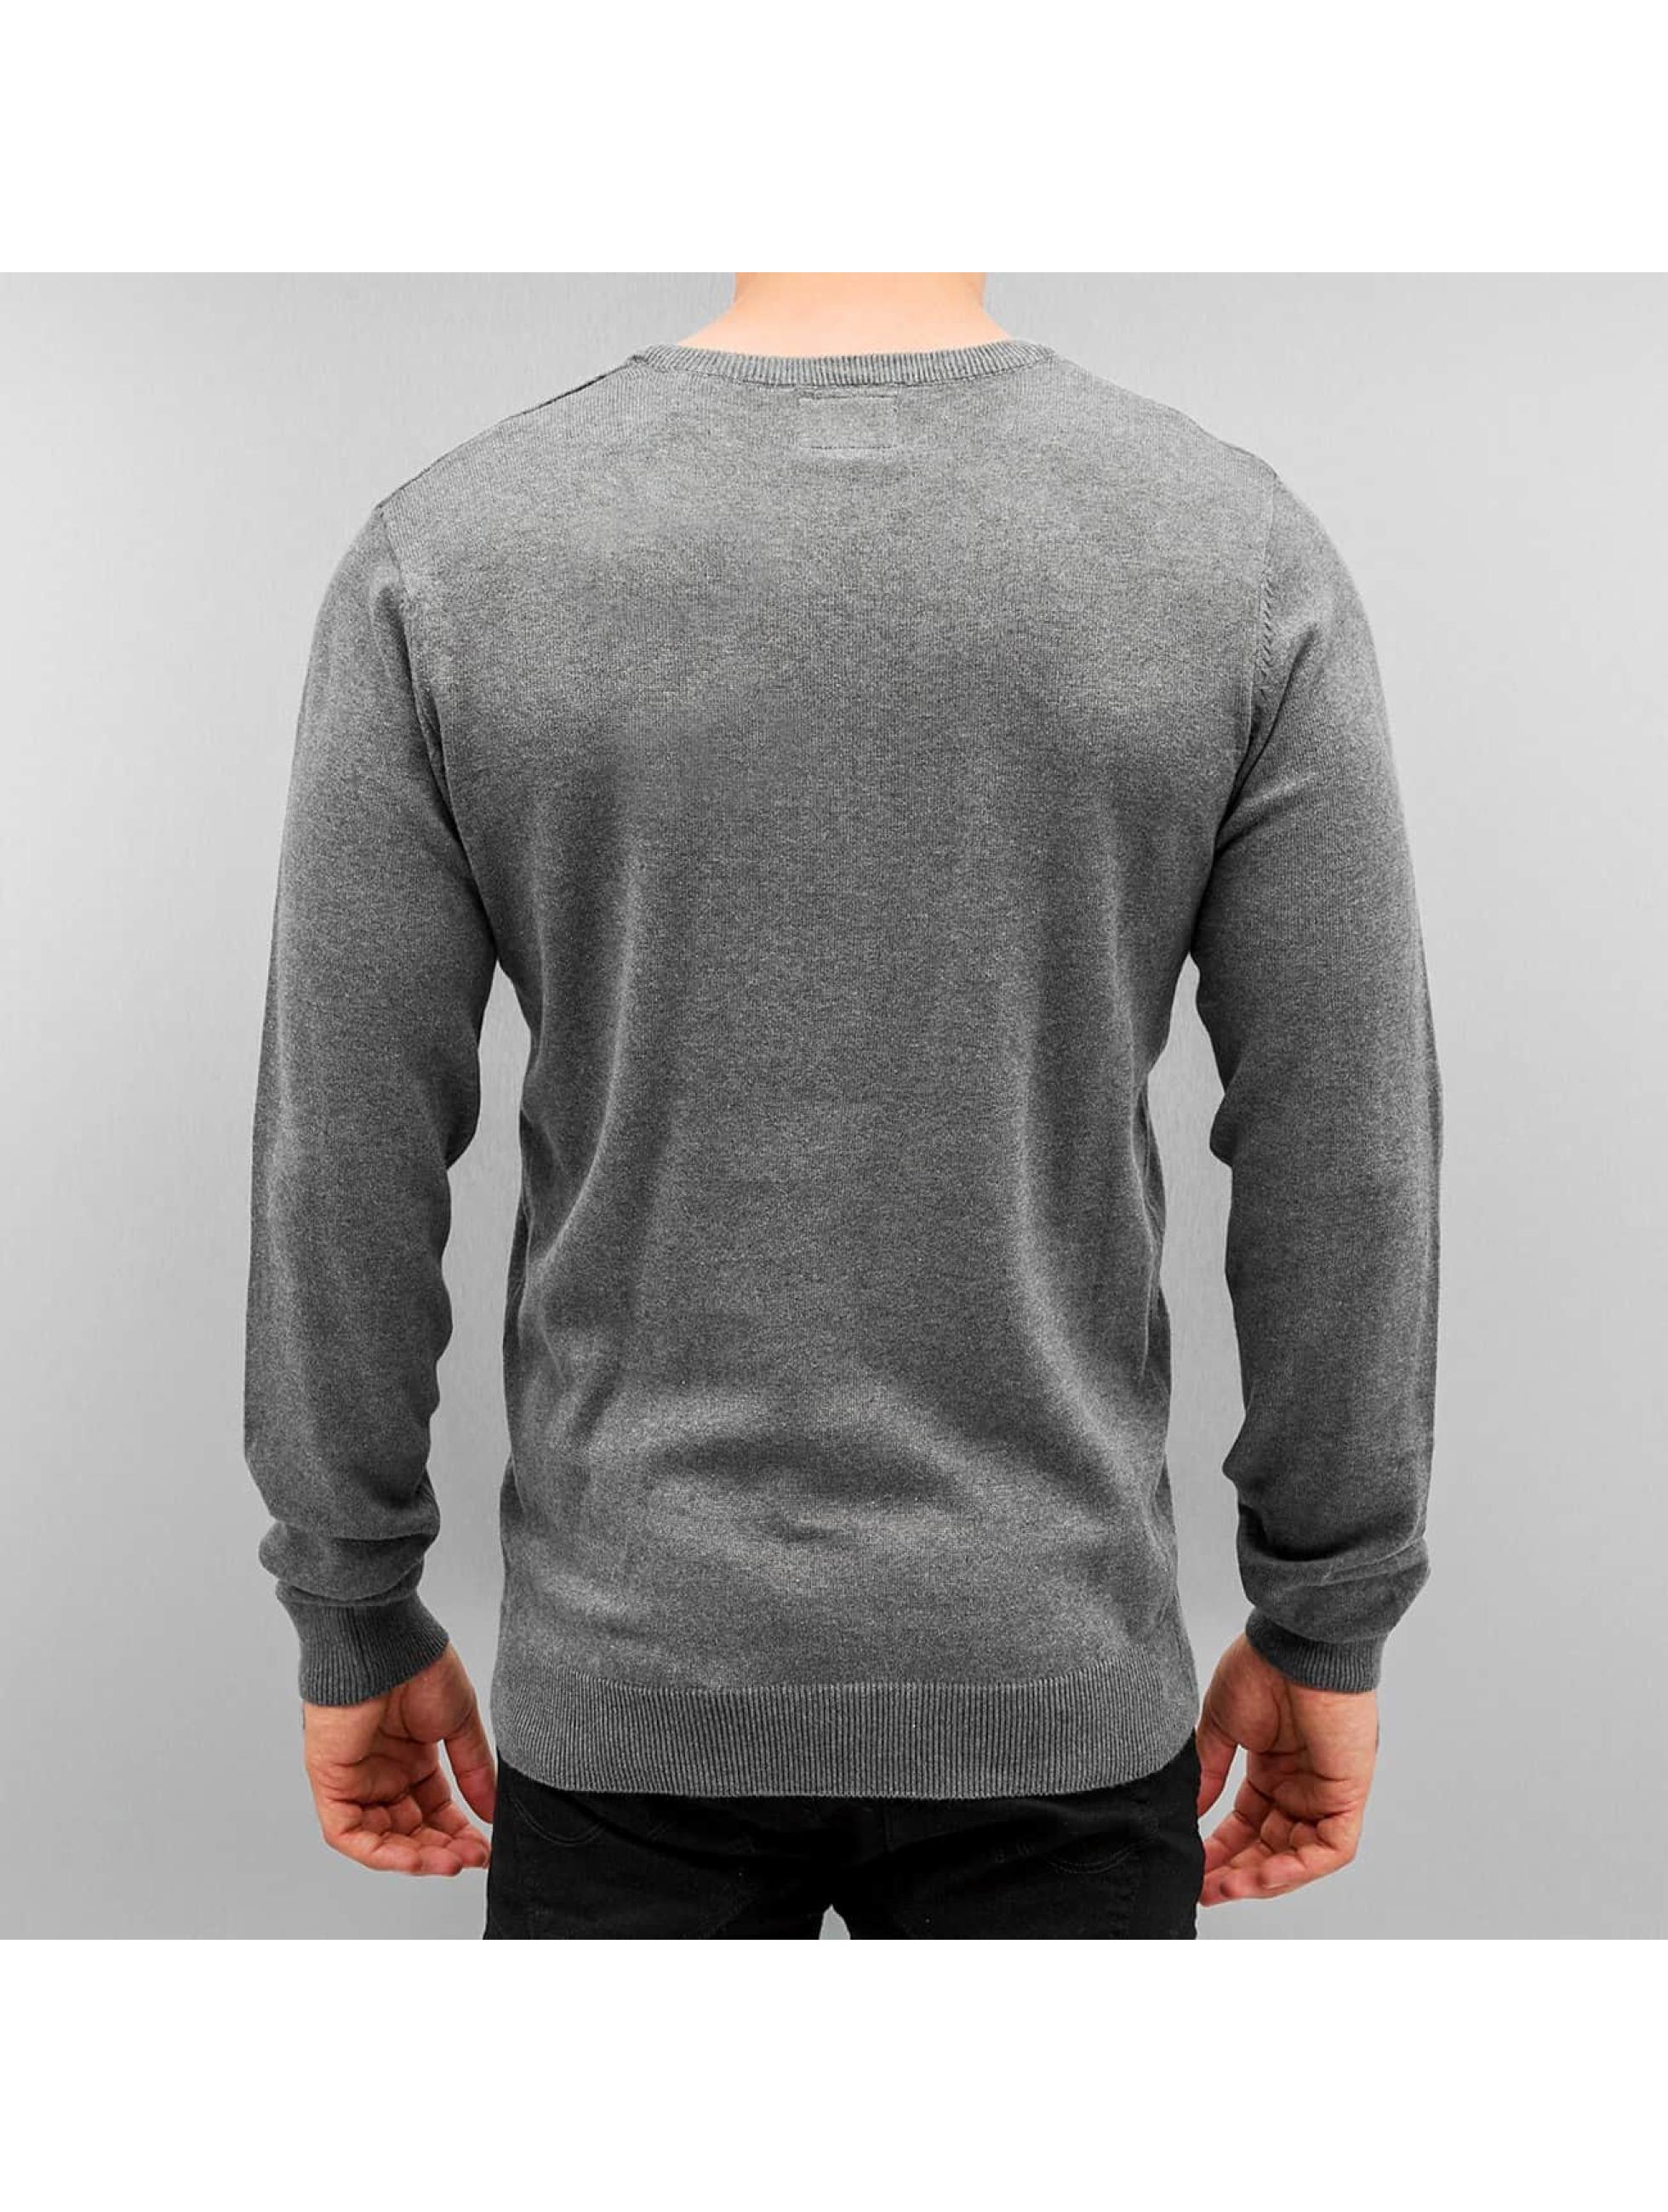 shine original basic gris homme sweat pull shine original acheter pas cher haut 254866. Black Bedroom Furniture Sets. Home Design Ideas